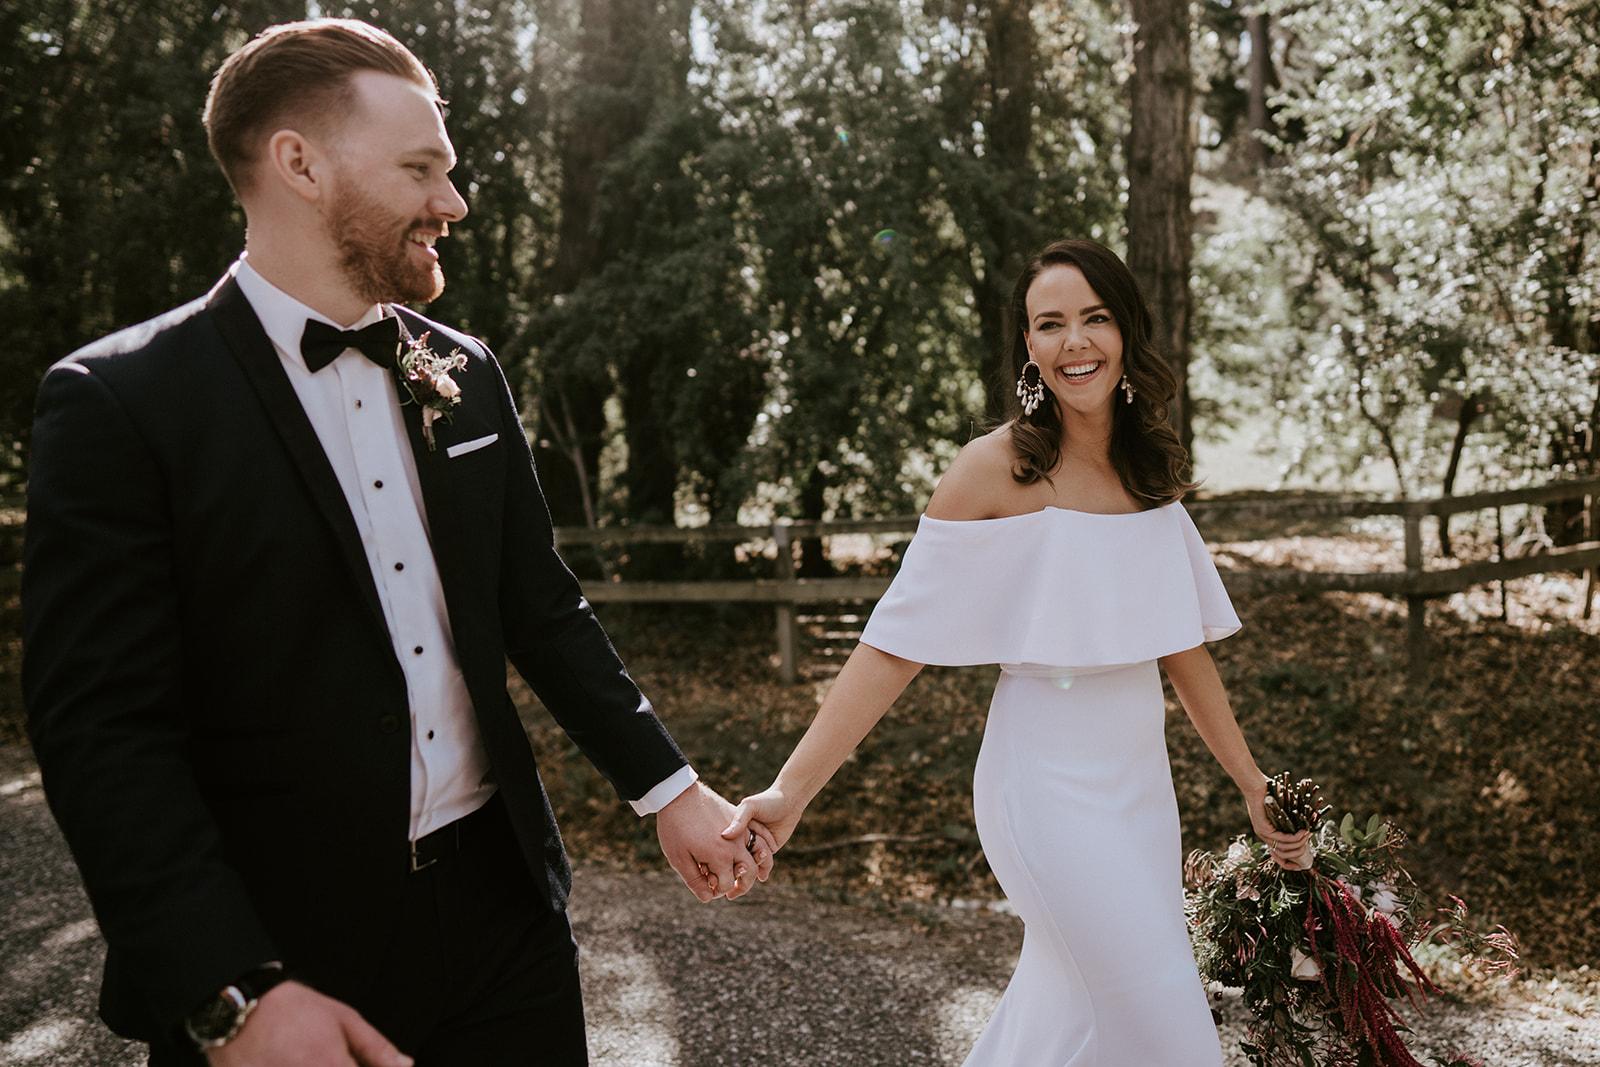 Queenstown Wedding Planner Simply Perfect Weddings